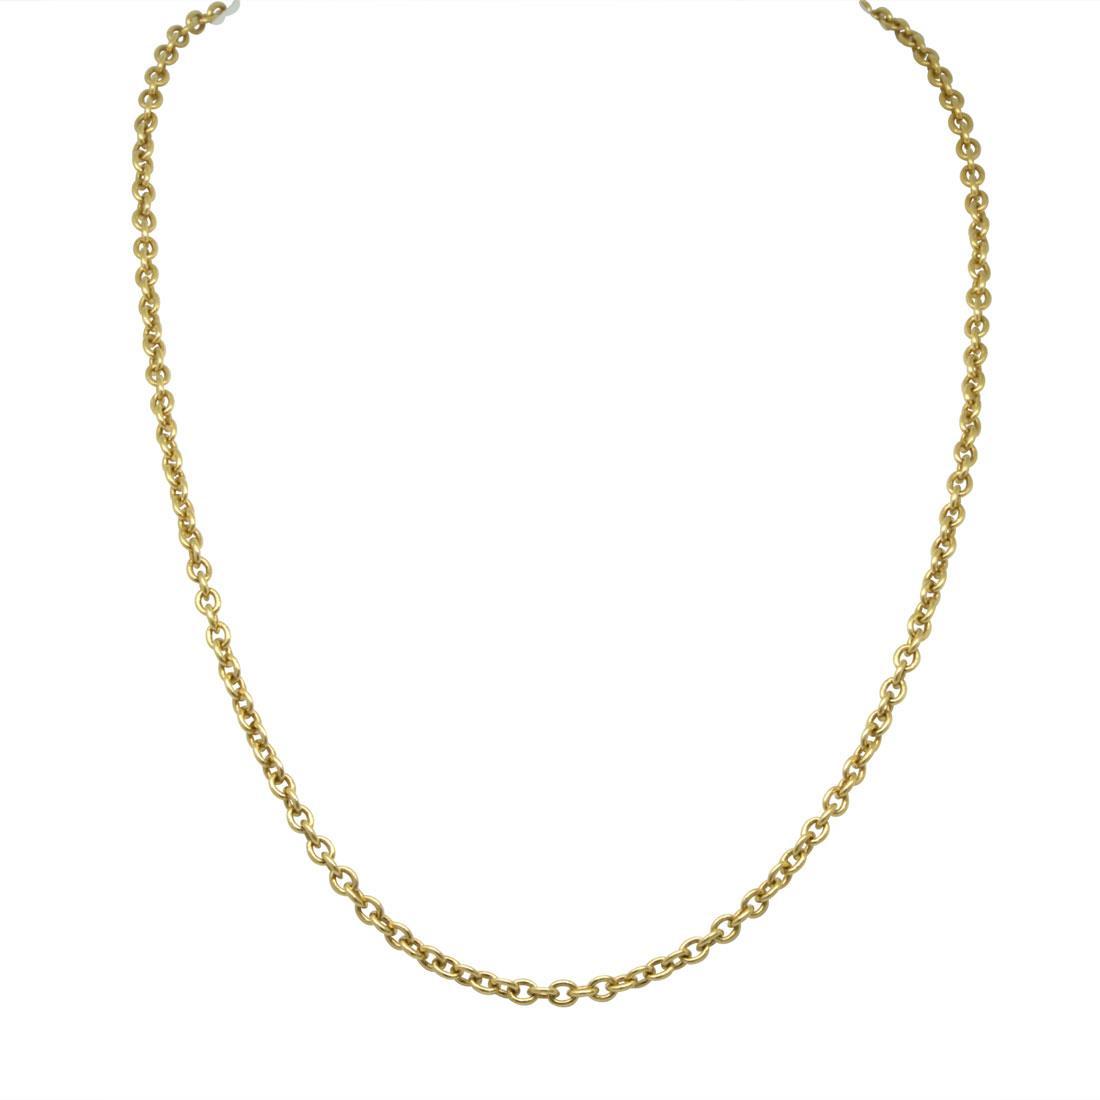 Collana in oro giallo - BULGARI